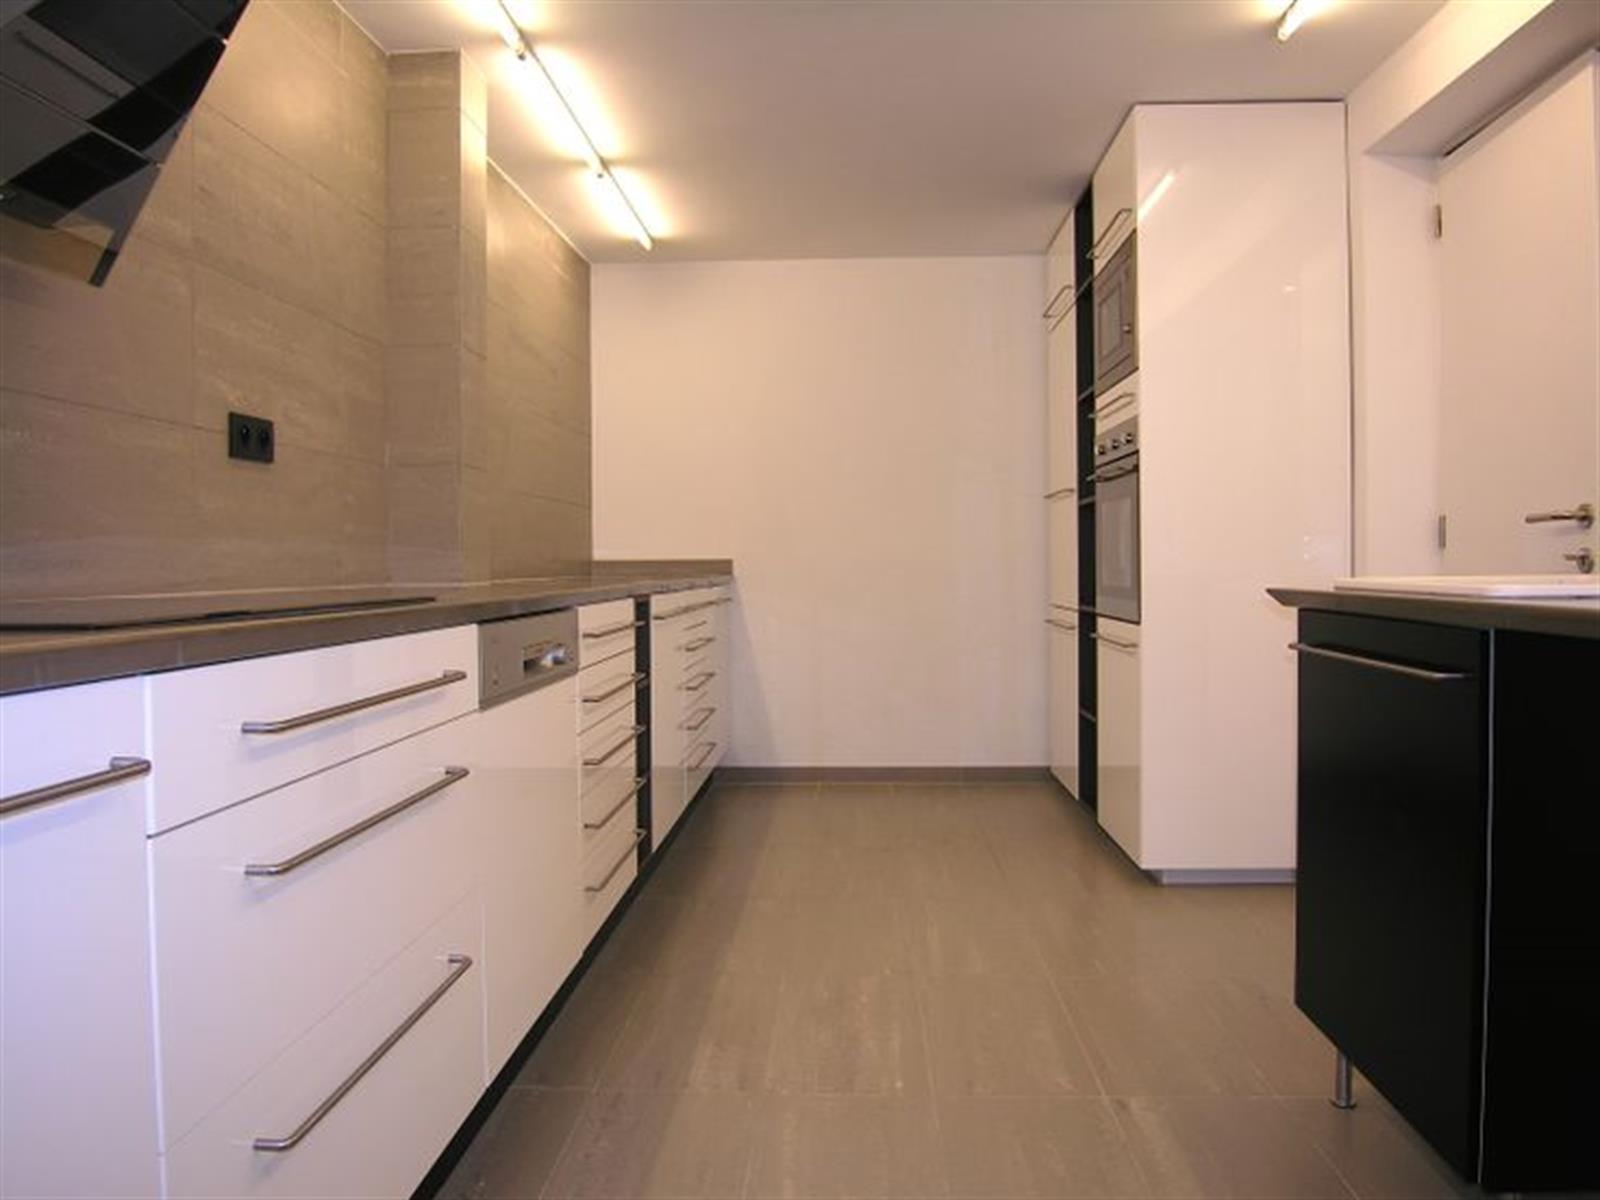 Loft - Etterbeek - #4448724-7